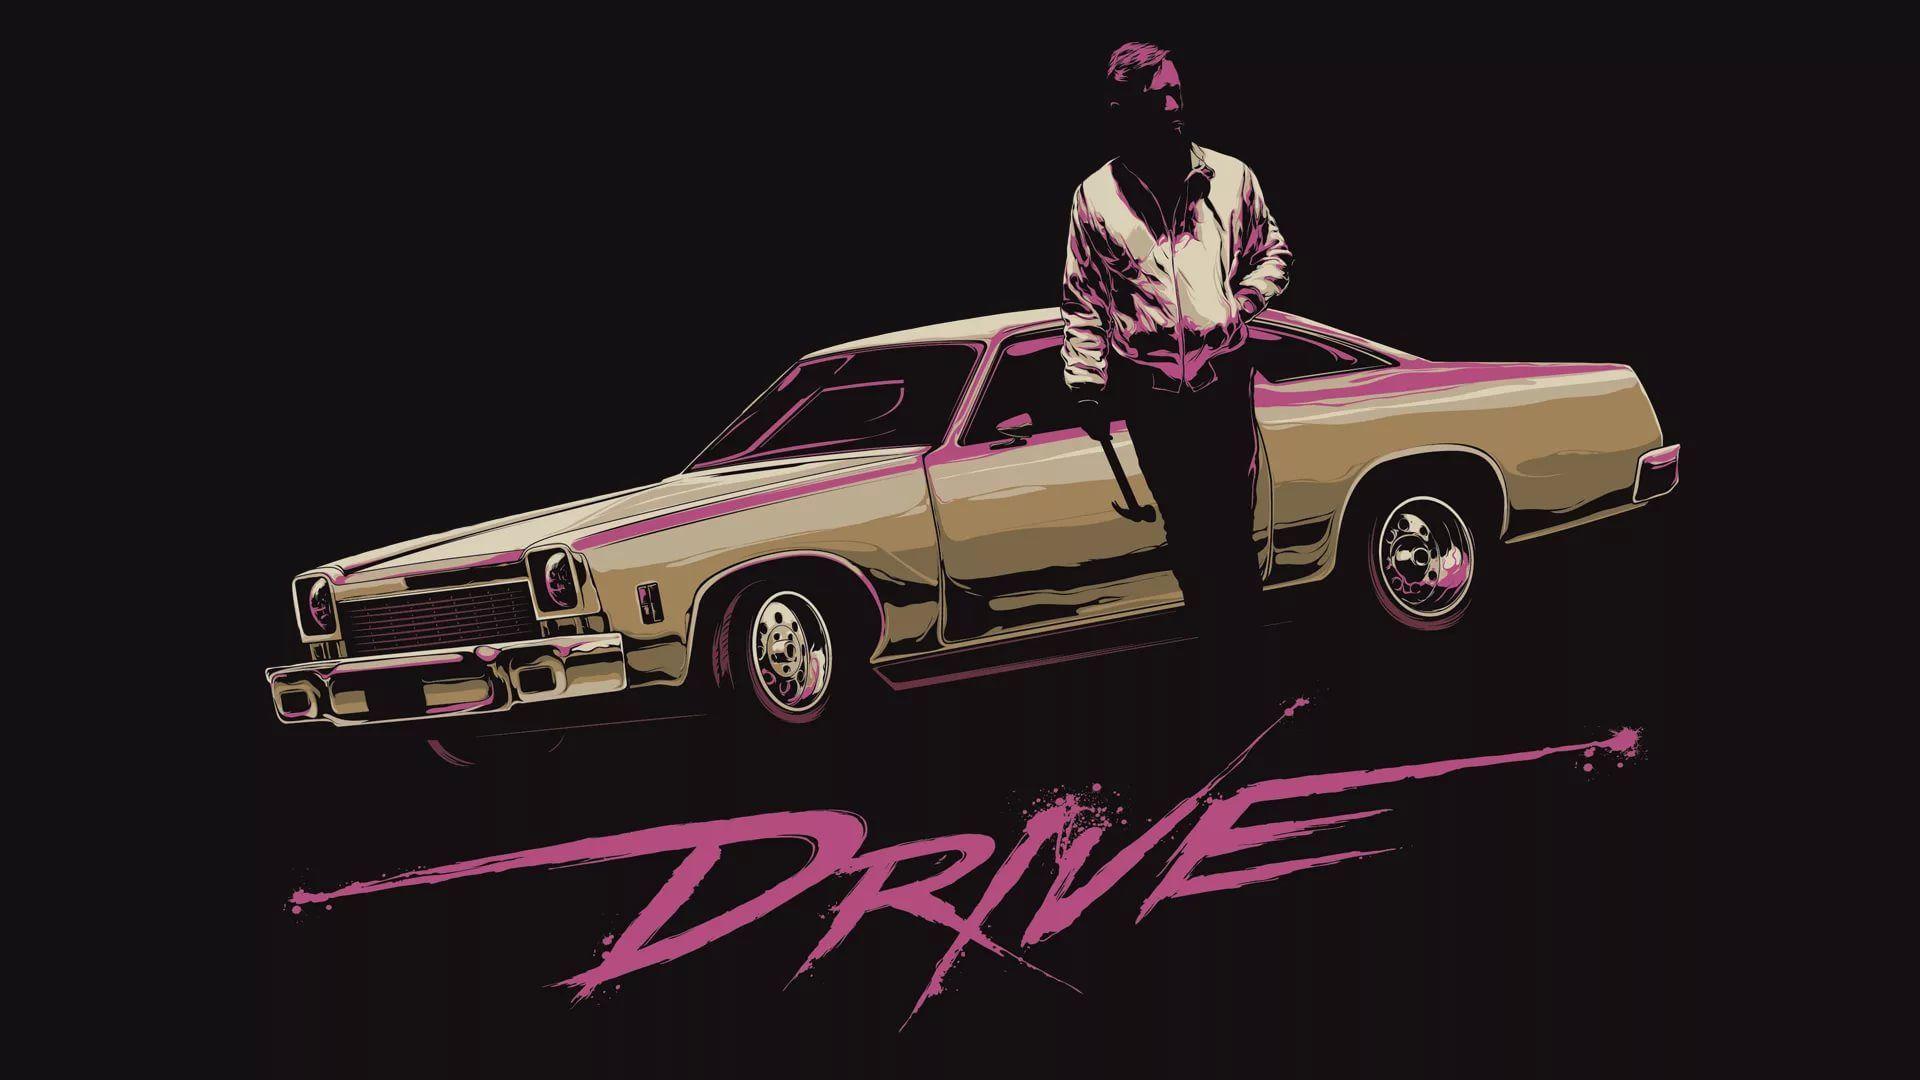 Drive Movie desktop wallpaper